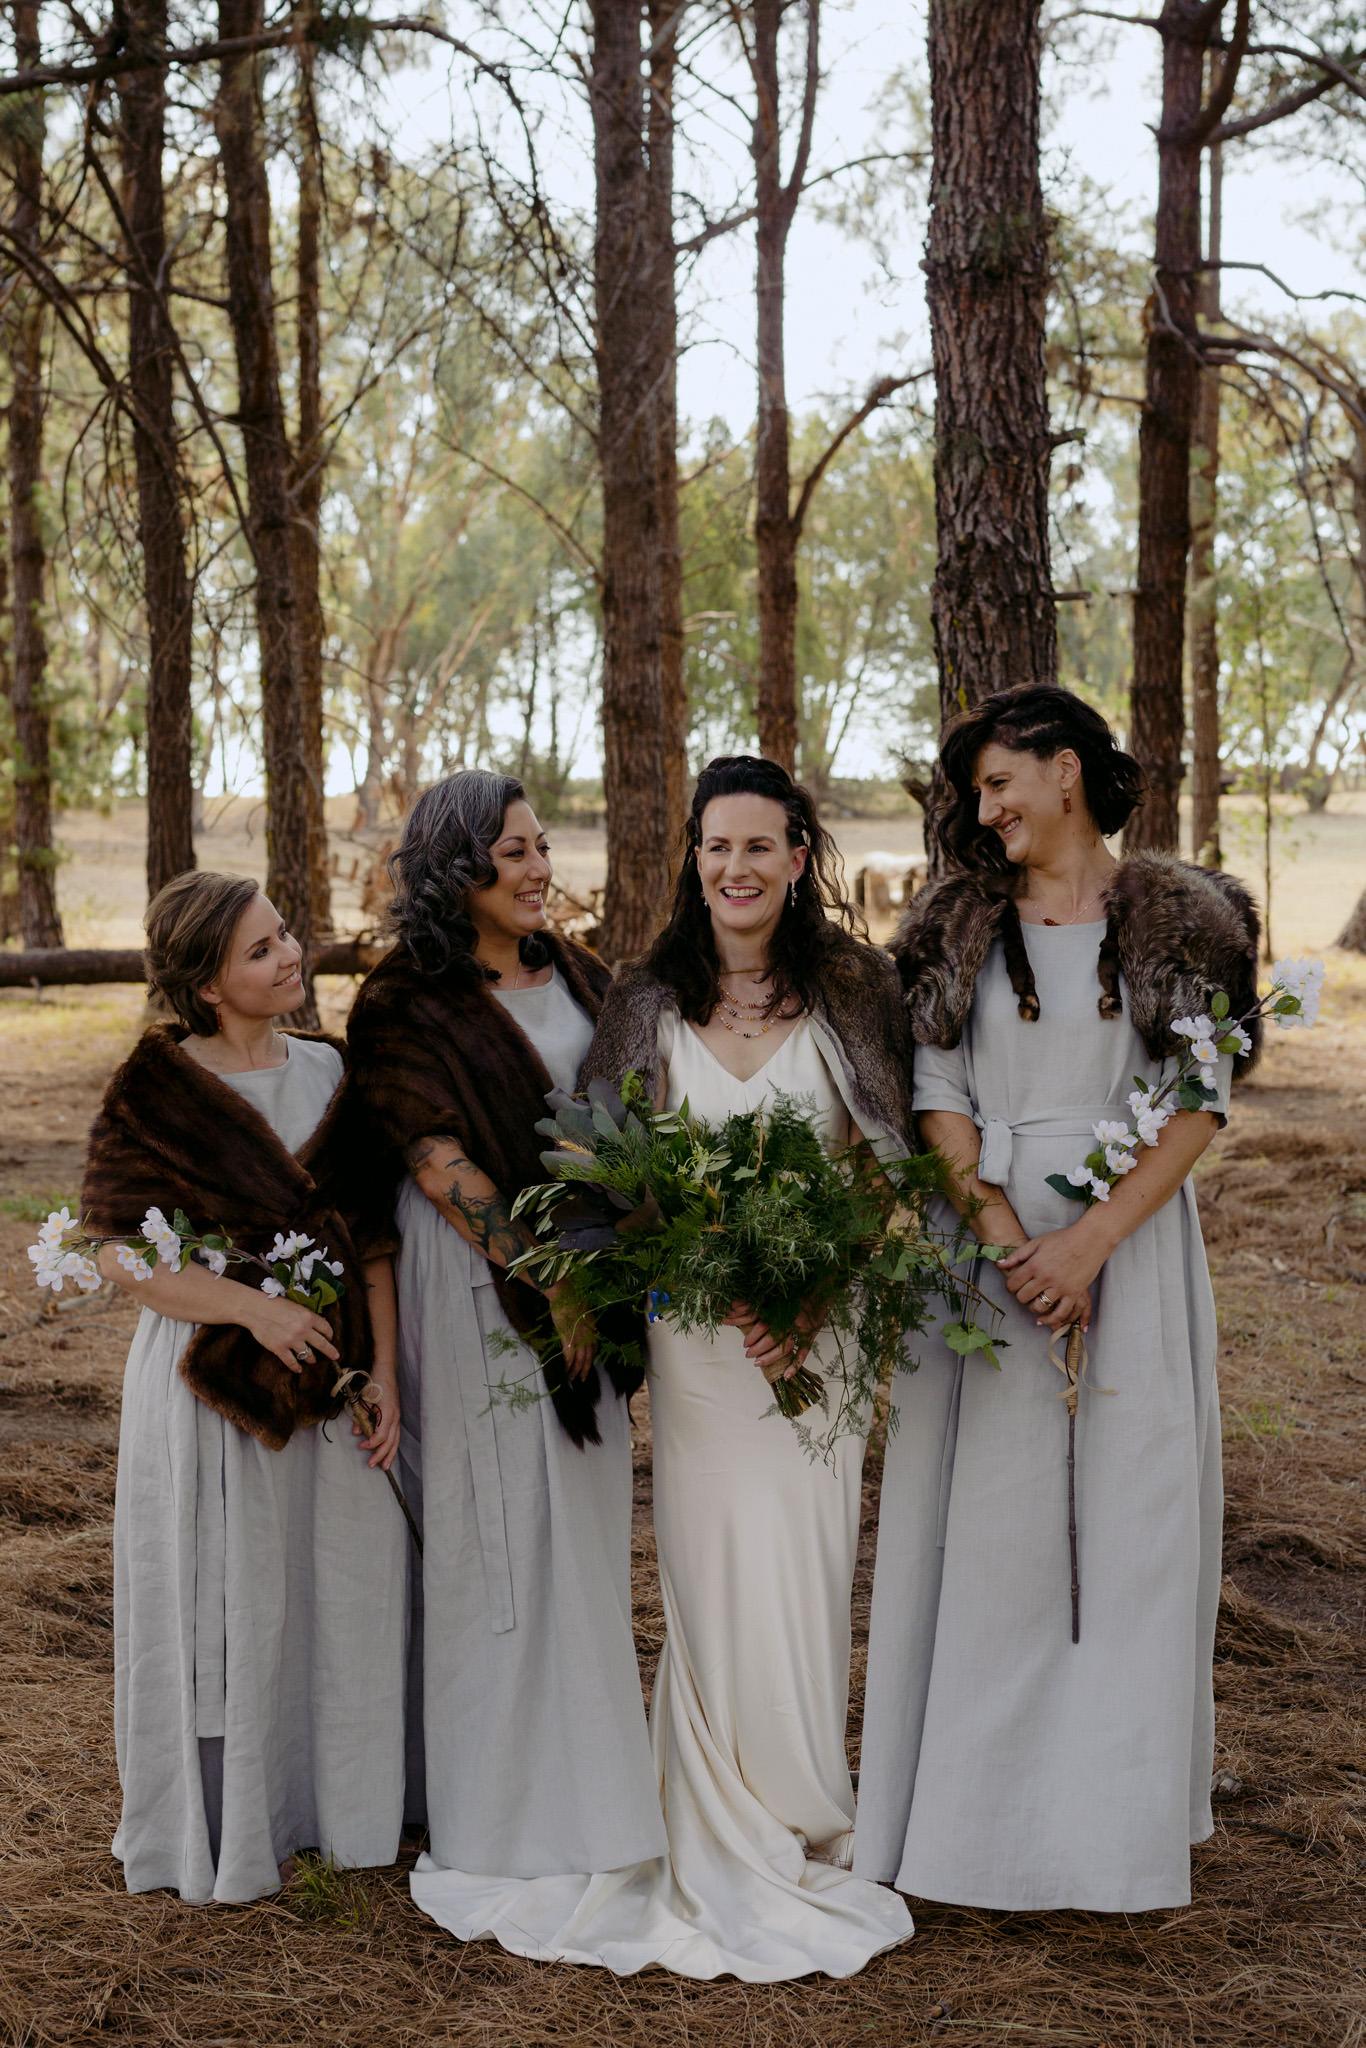 Yarralumla Woolshed Canberra Wedding Photographer Erin Latimore_292.JPG